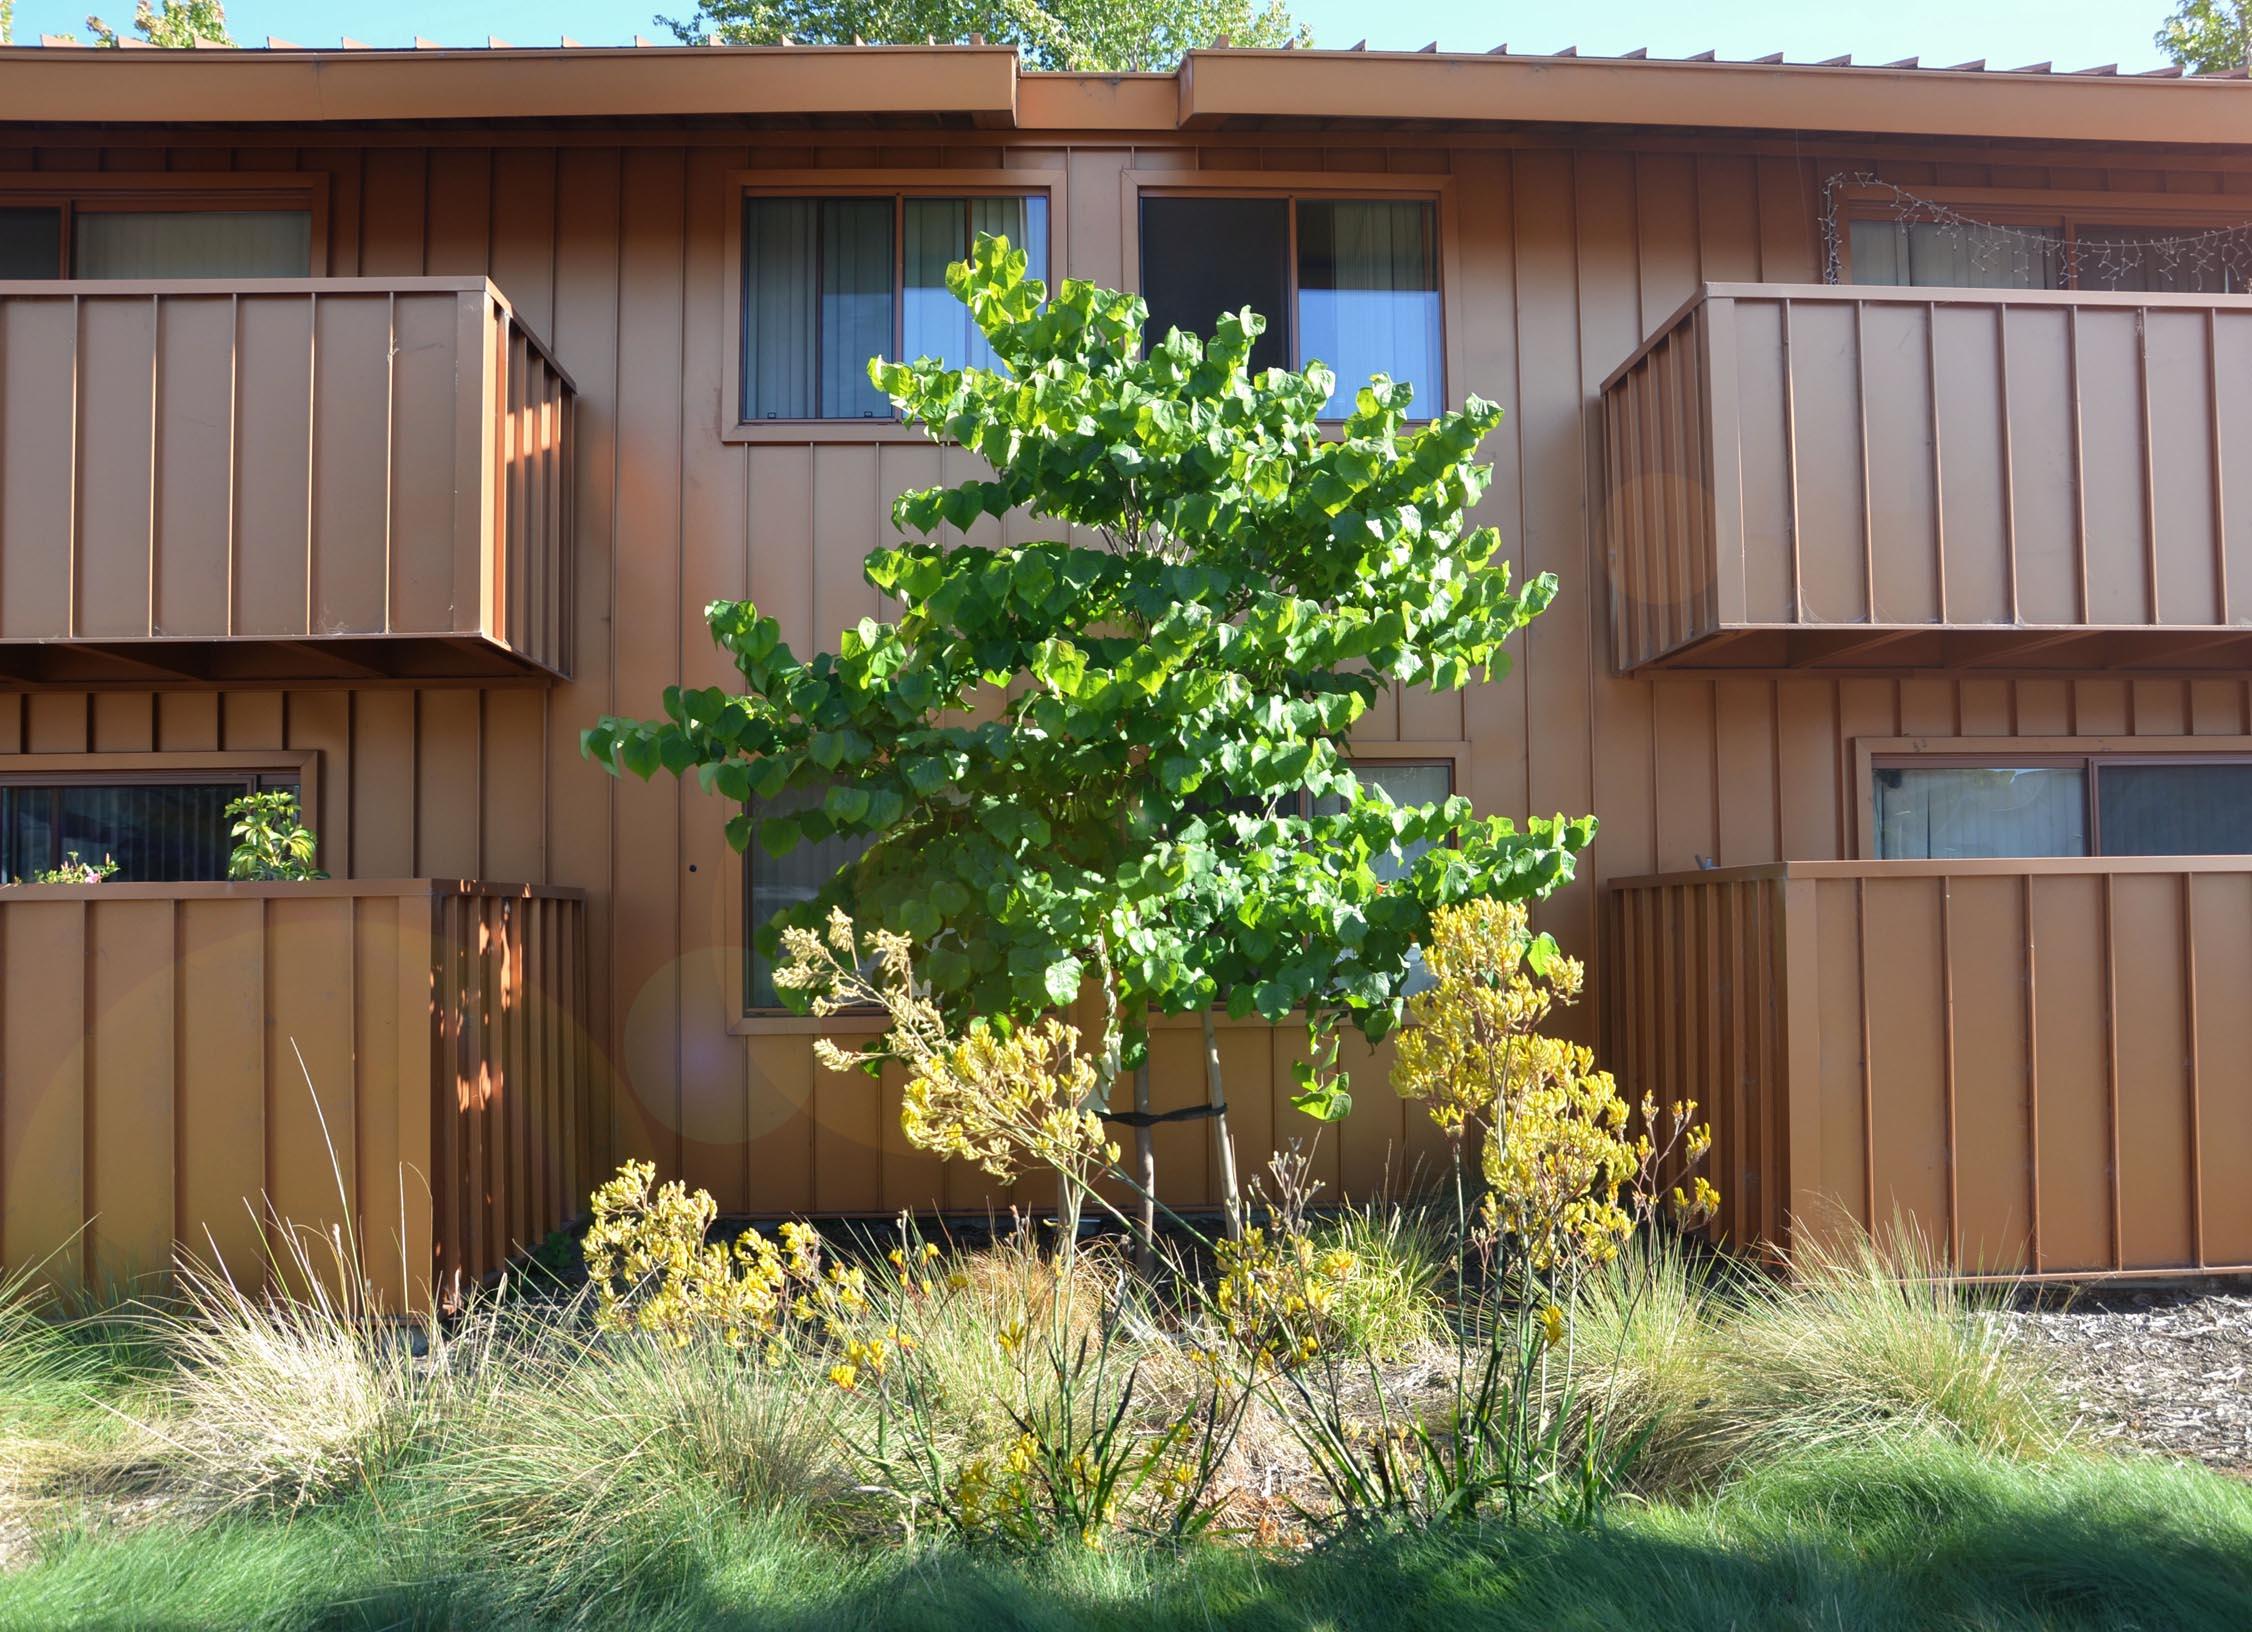 TINA CHEE landscape studio_LAKESIDE-bldg garden 1.jpg